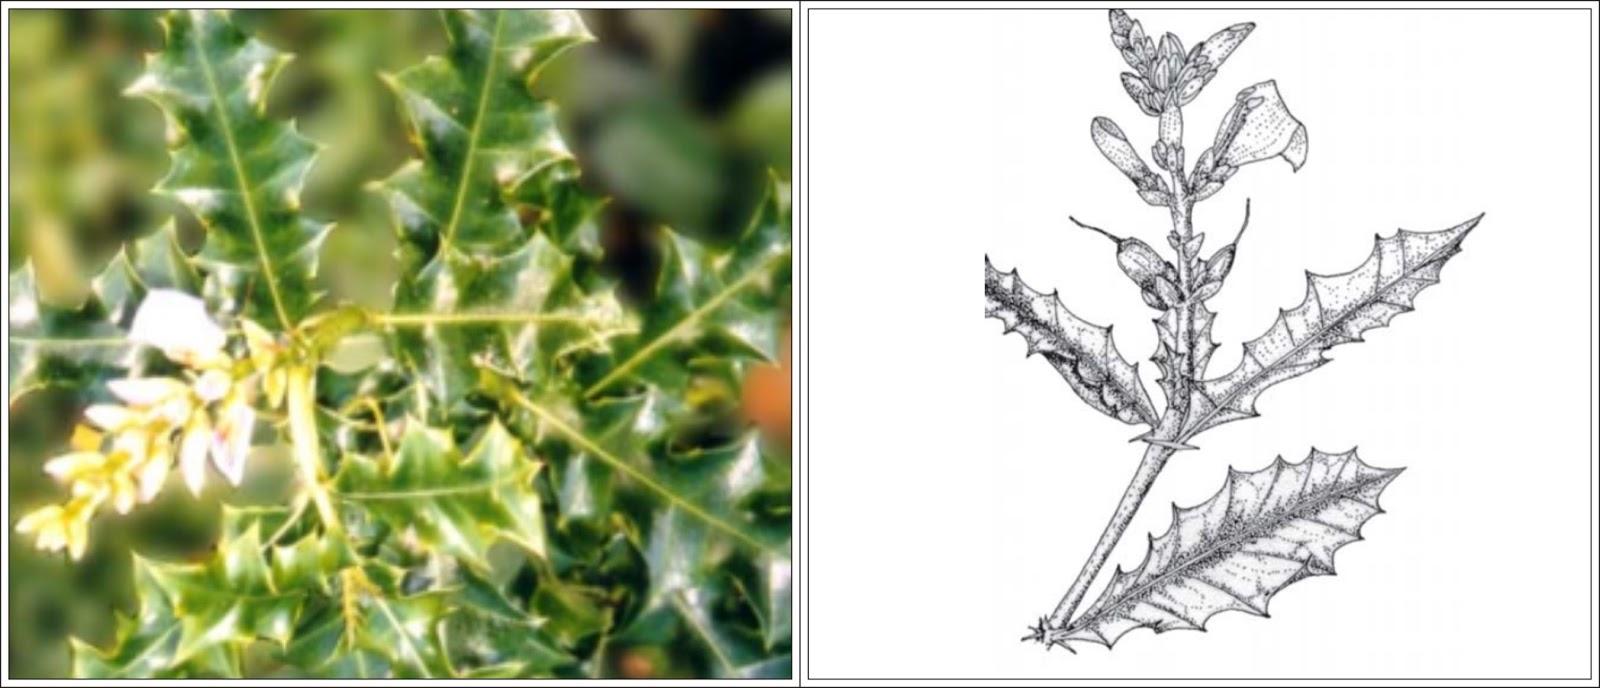 Mengenal Mangrove  Acanthus ilicifolius L  AanBLOG